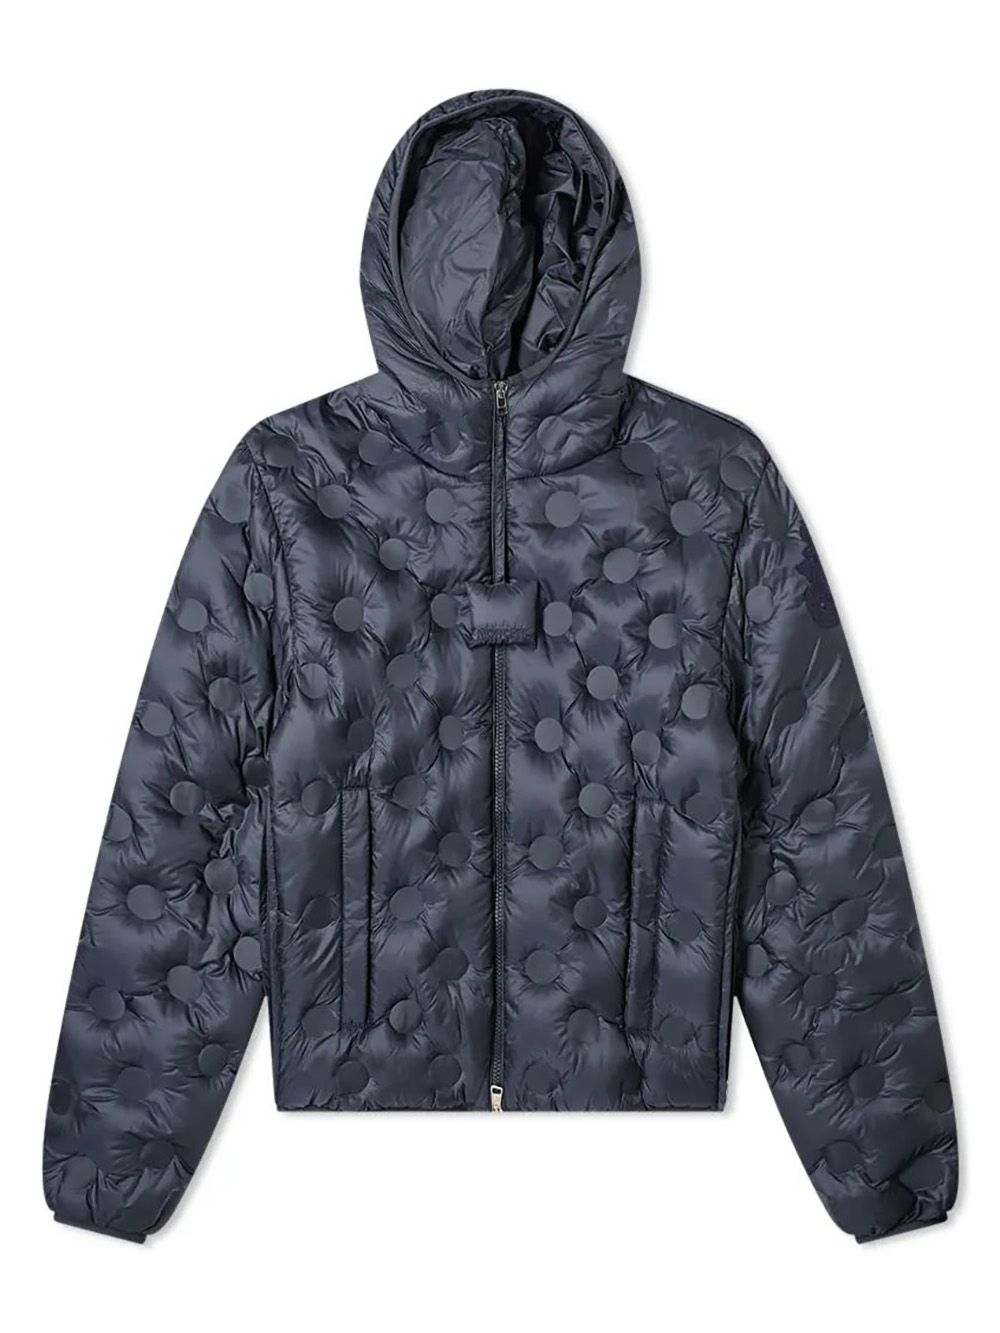 1 Moncler Jw Anderson Abbotts Jacket